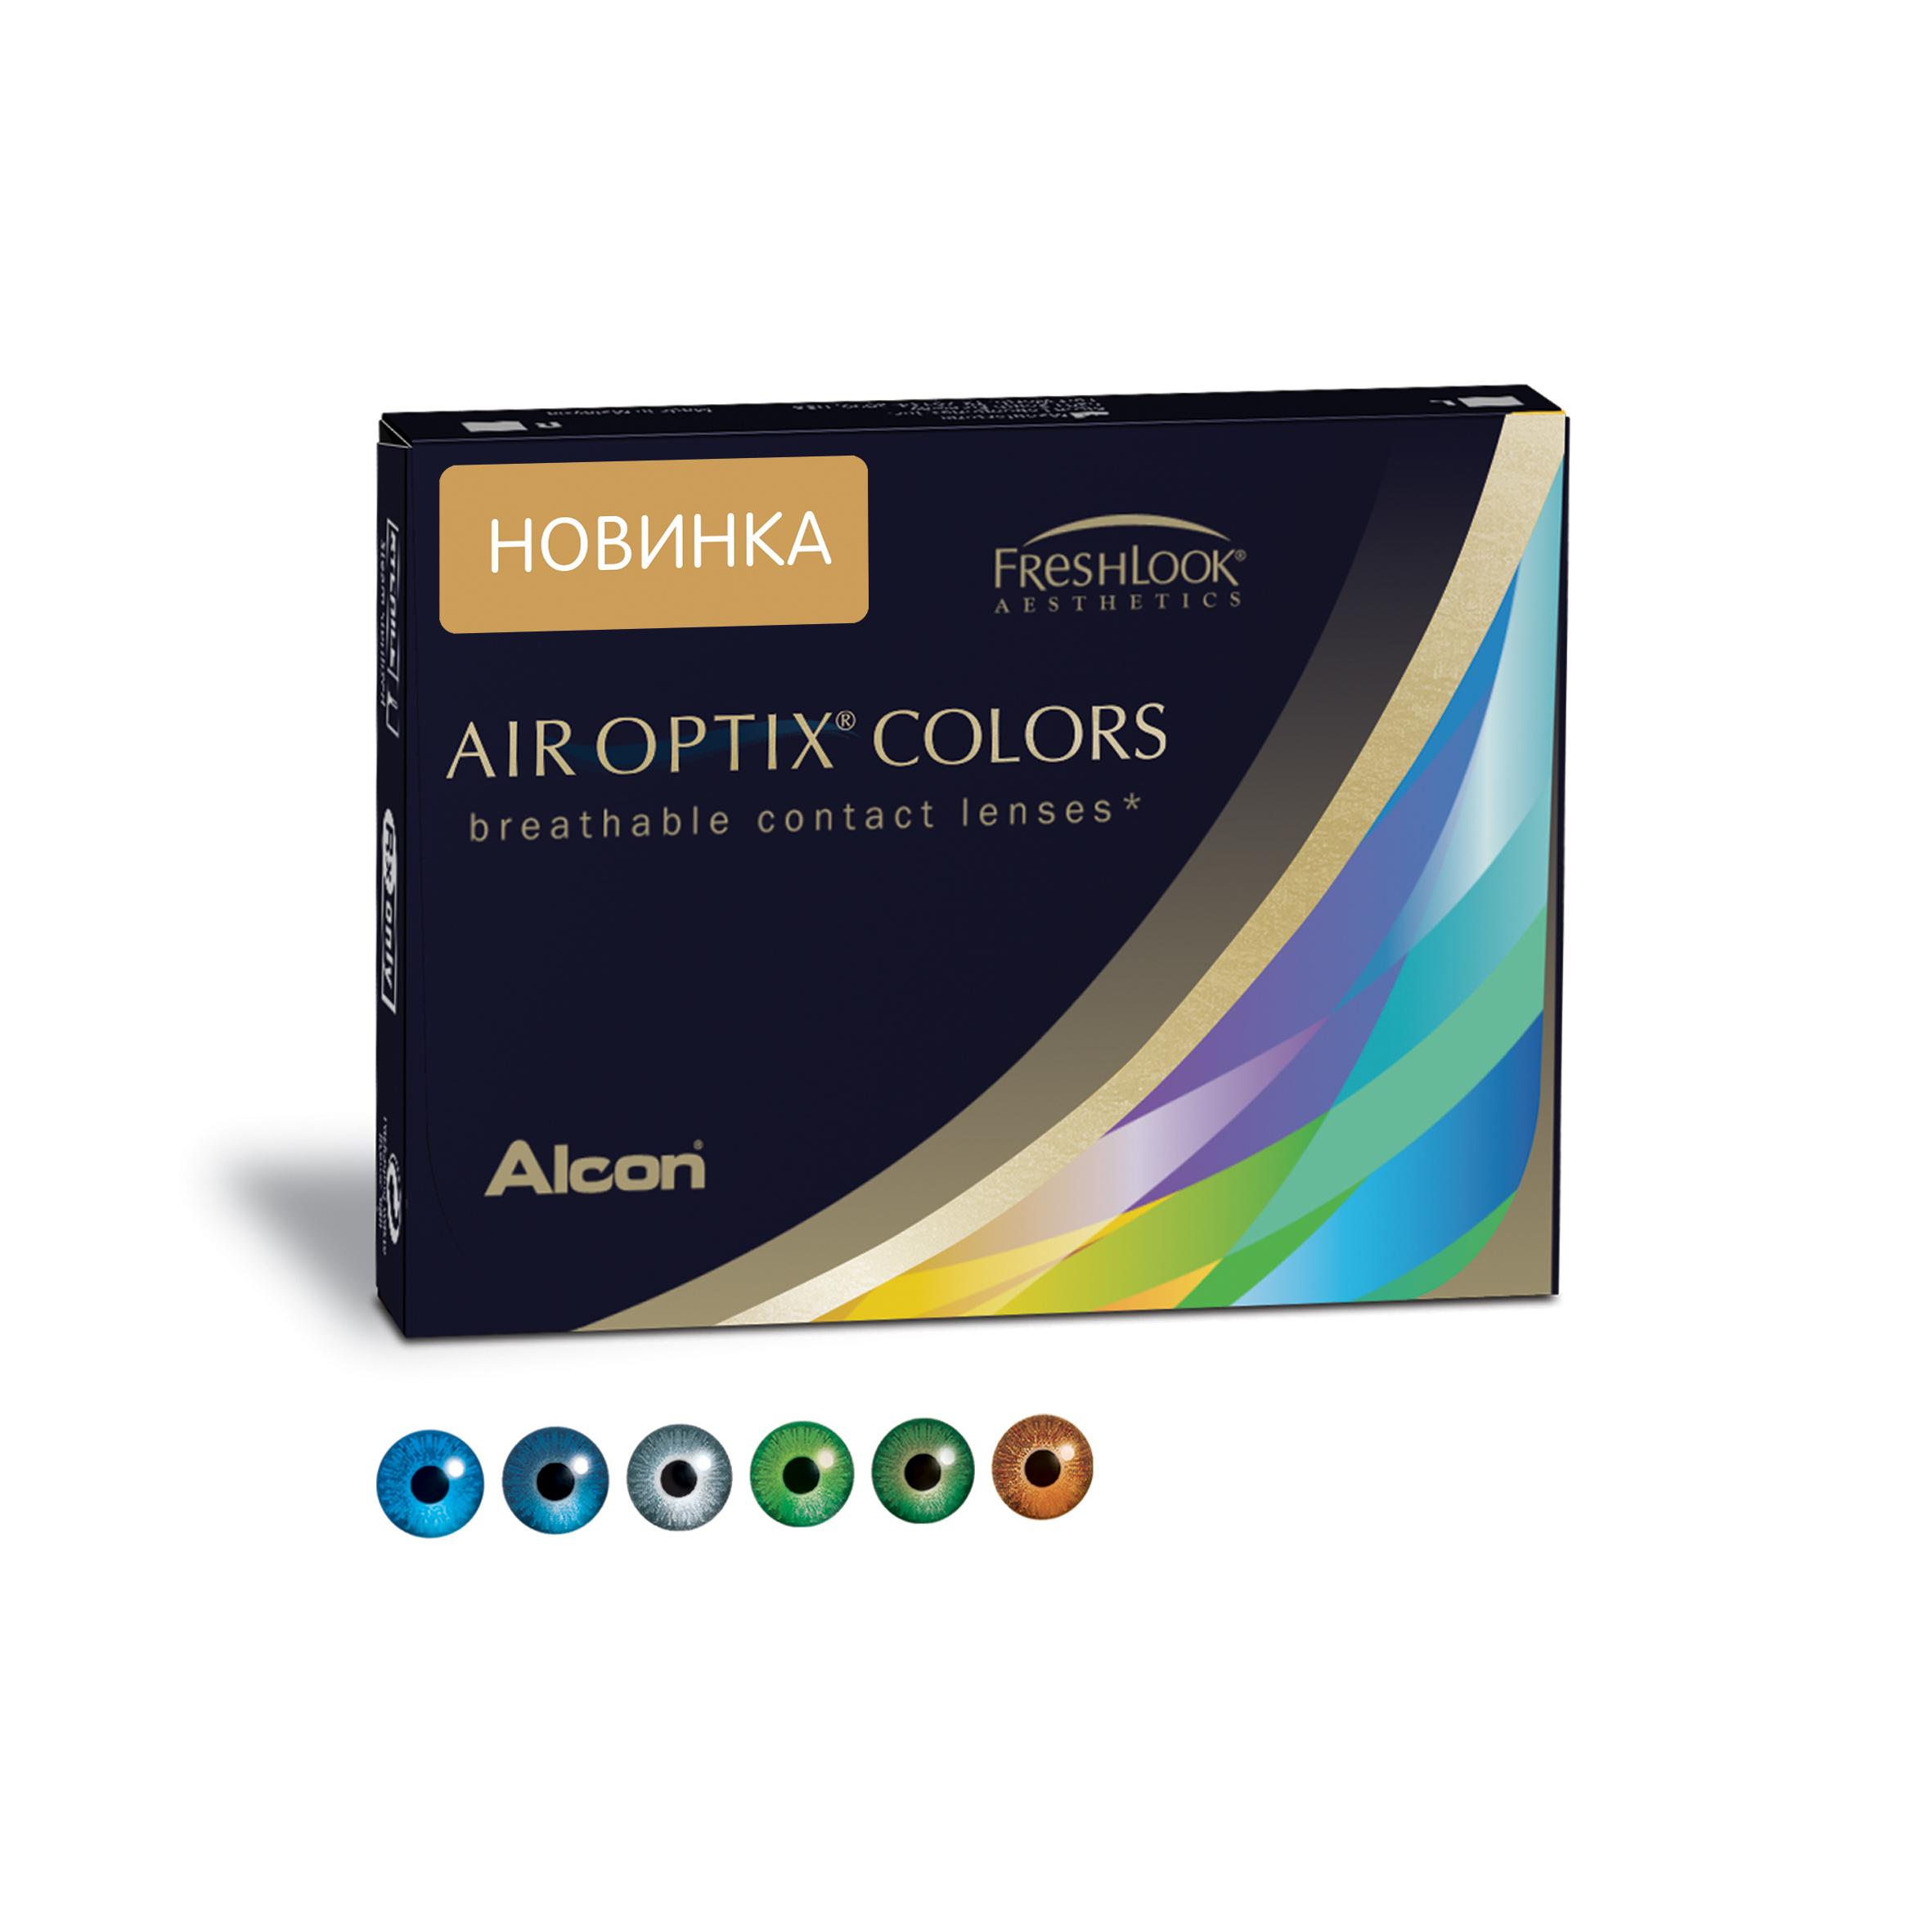 Аlcon контактные линзы Air Optix Colors 2 шт -4.00 Green31746234Мягкие контактные линзы